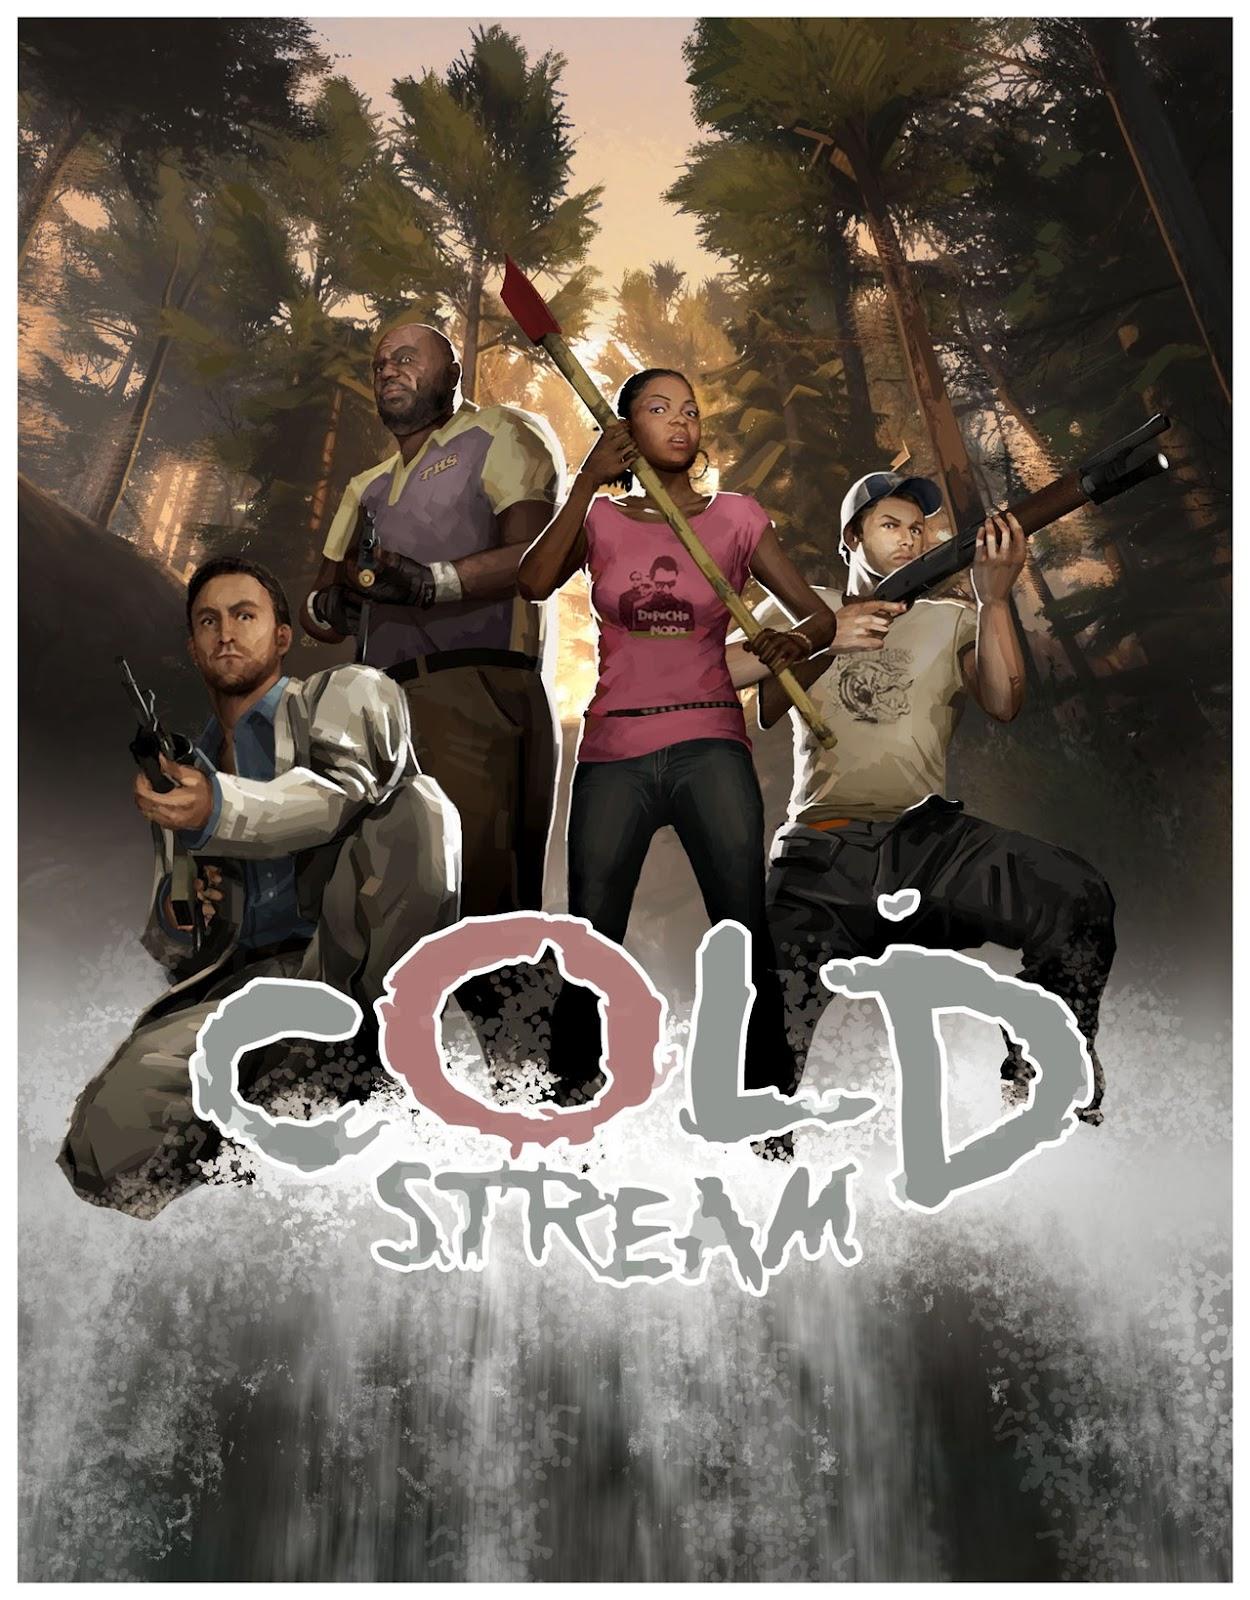 Left 4 Dead 2 Cold Stream   Download Free Games Full Version with Keygen